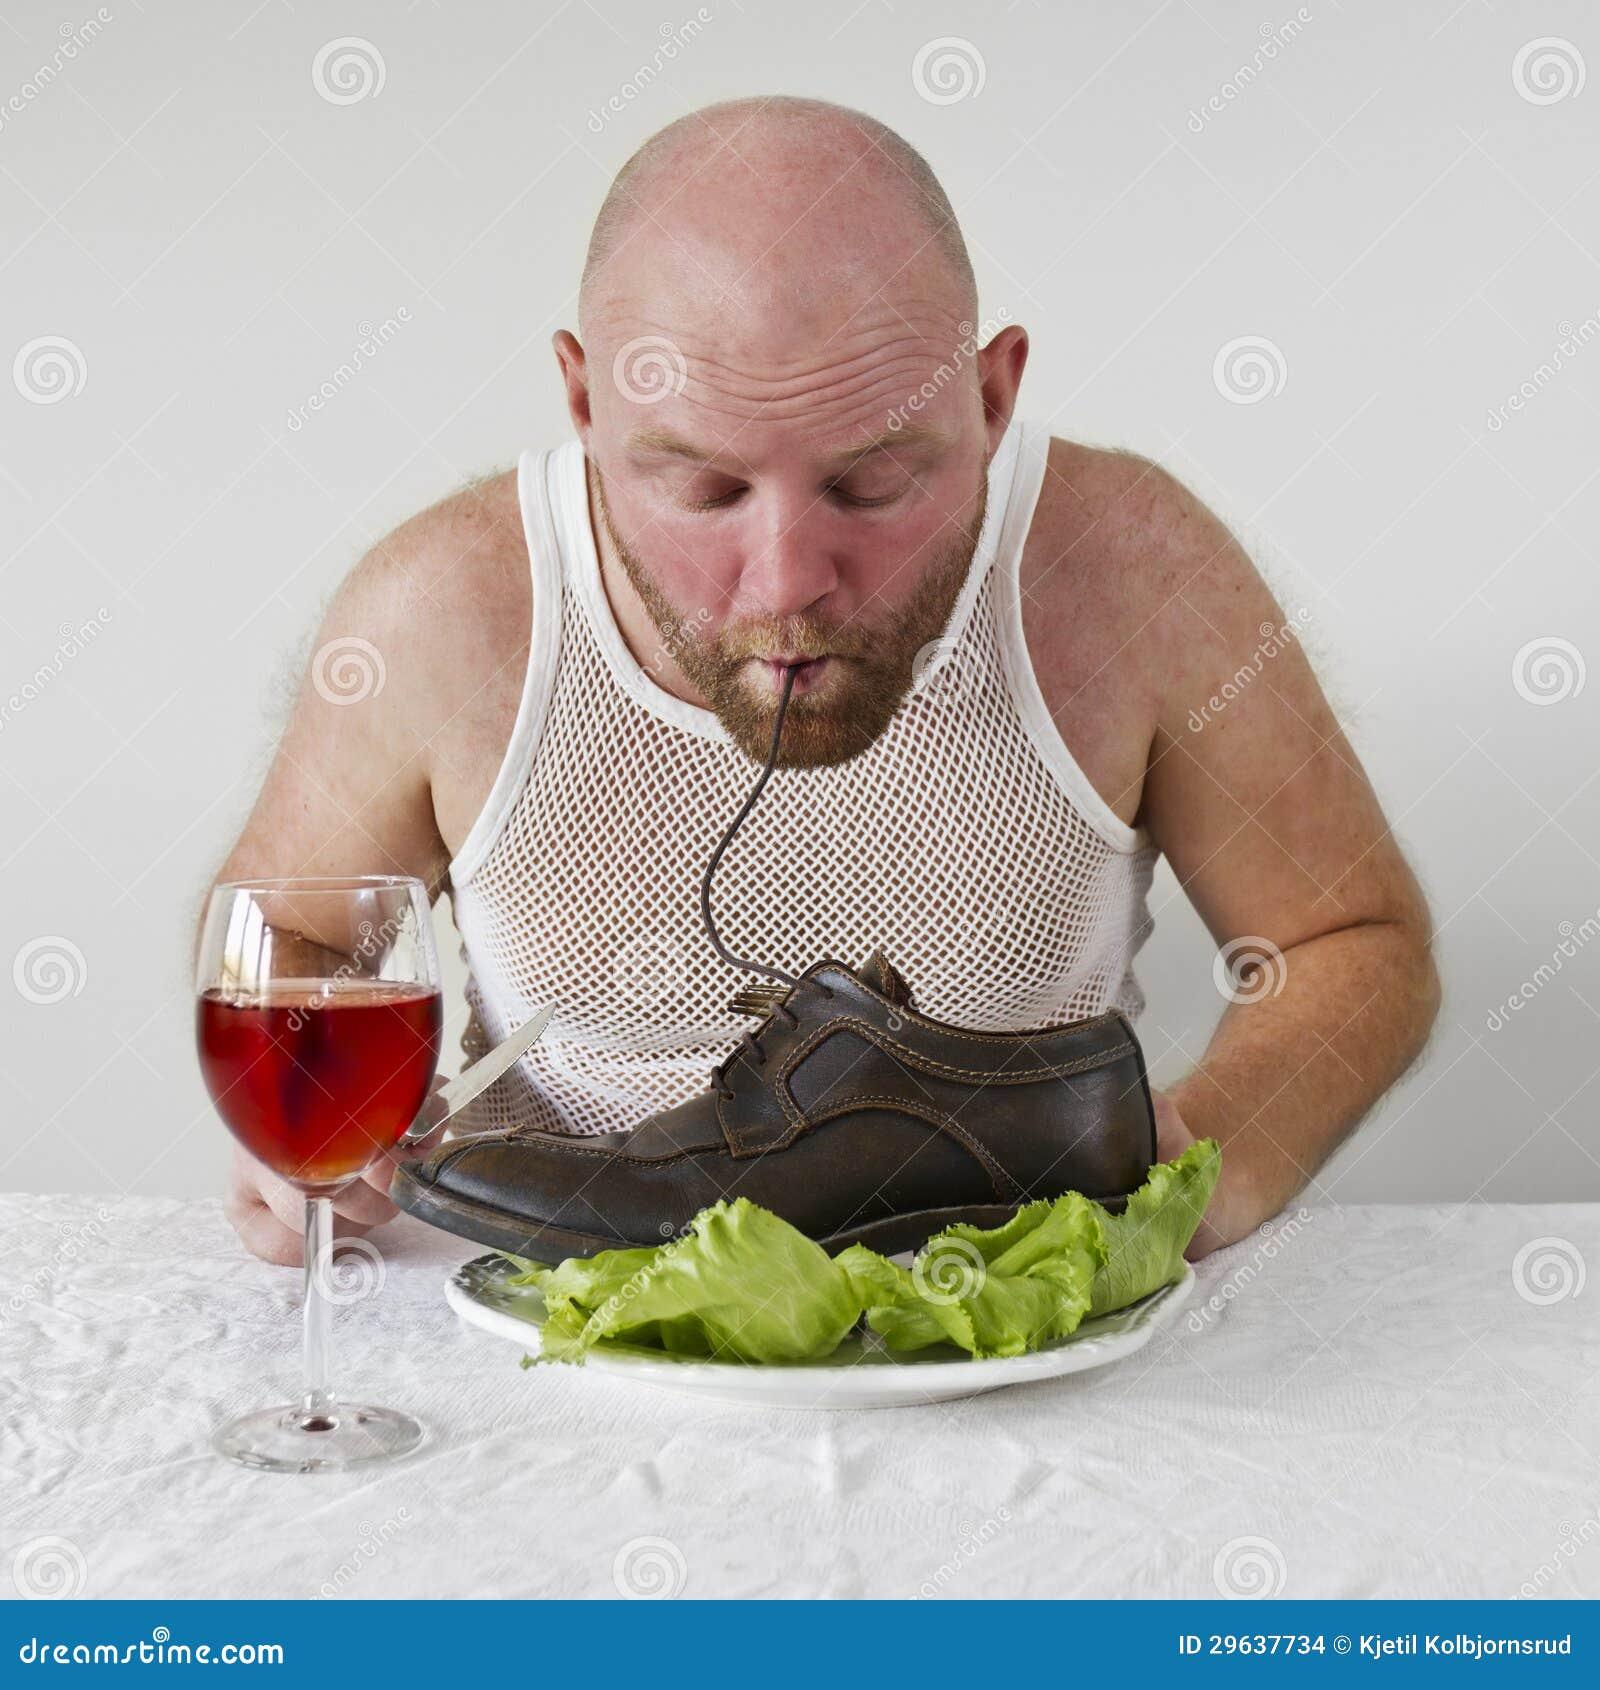 man-eats-shoes-29637734.jpg